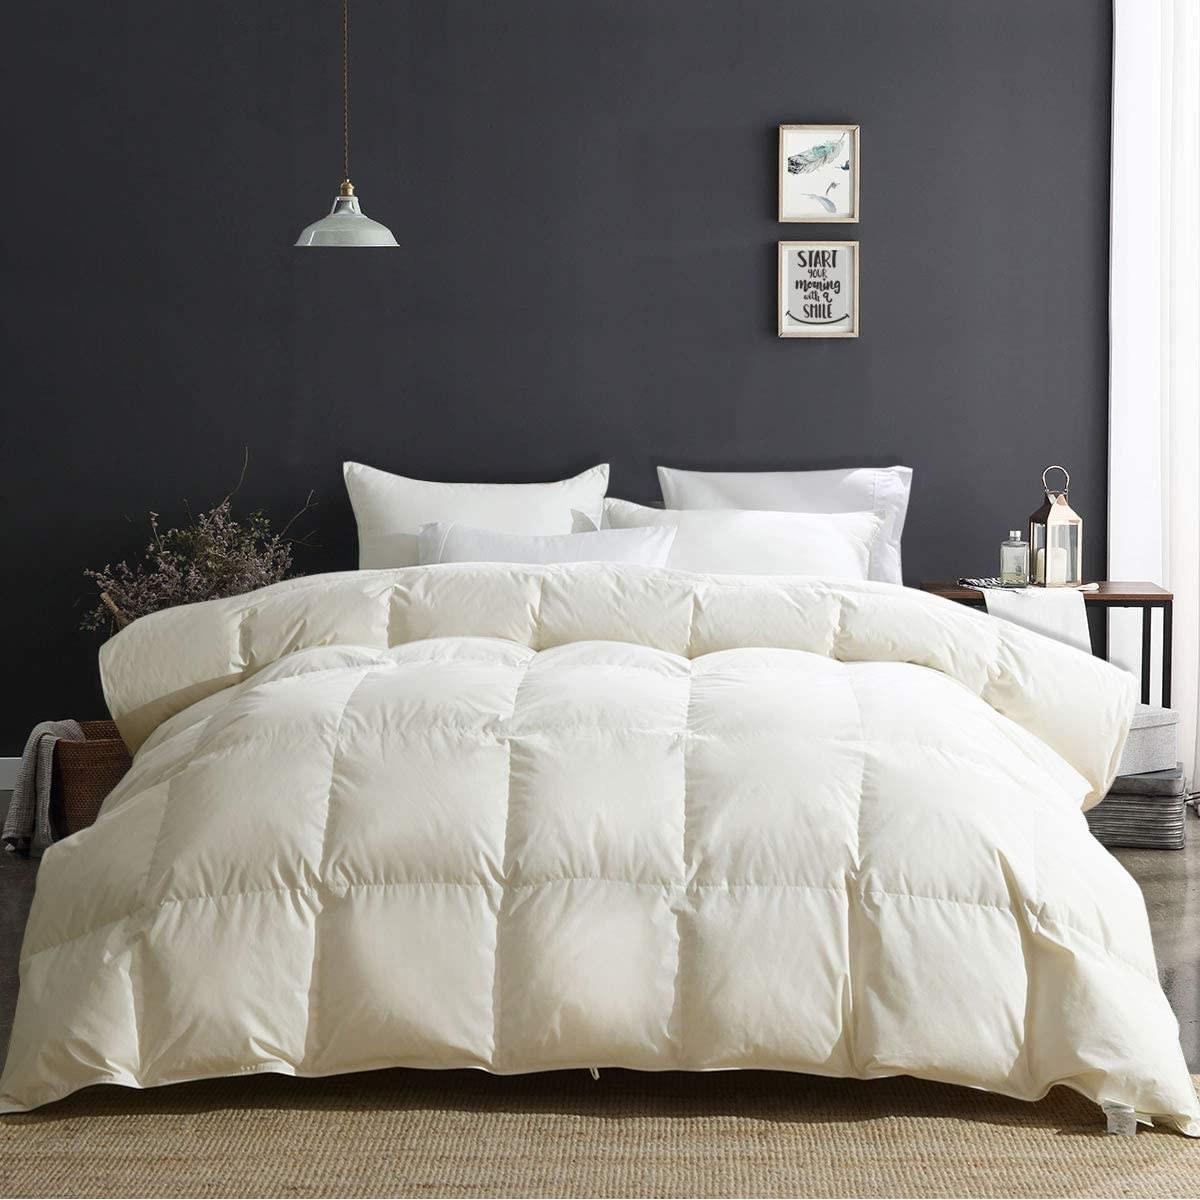 White comforter on mattress in bedroom